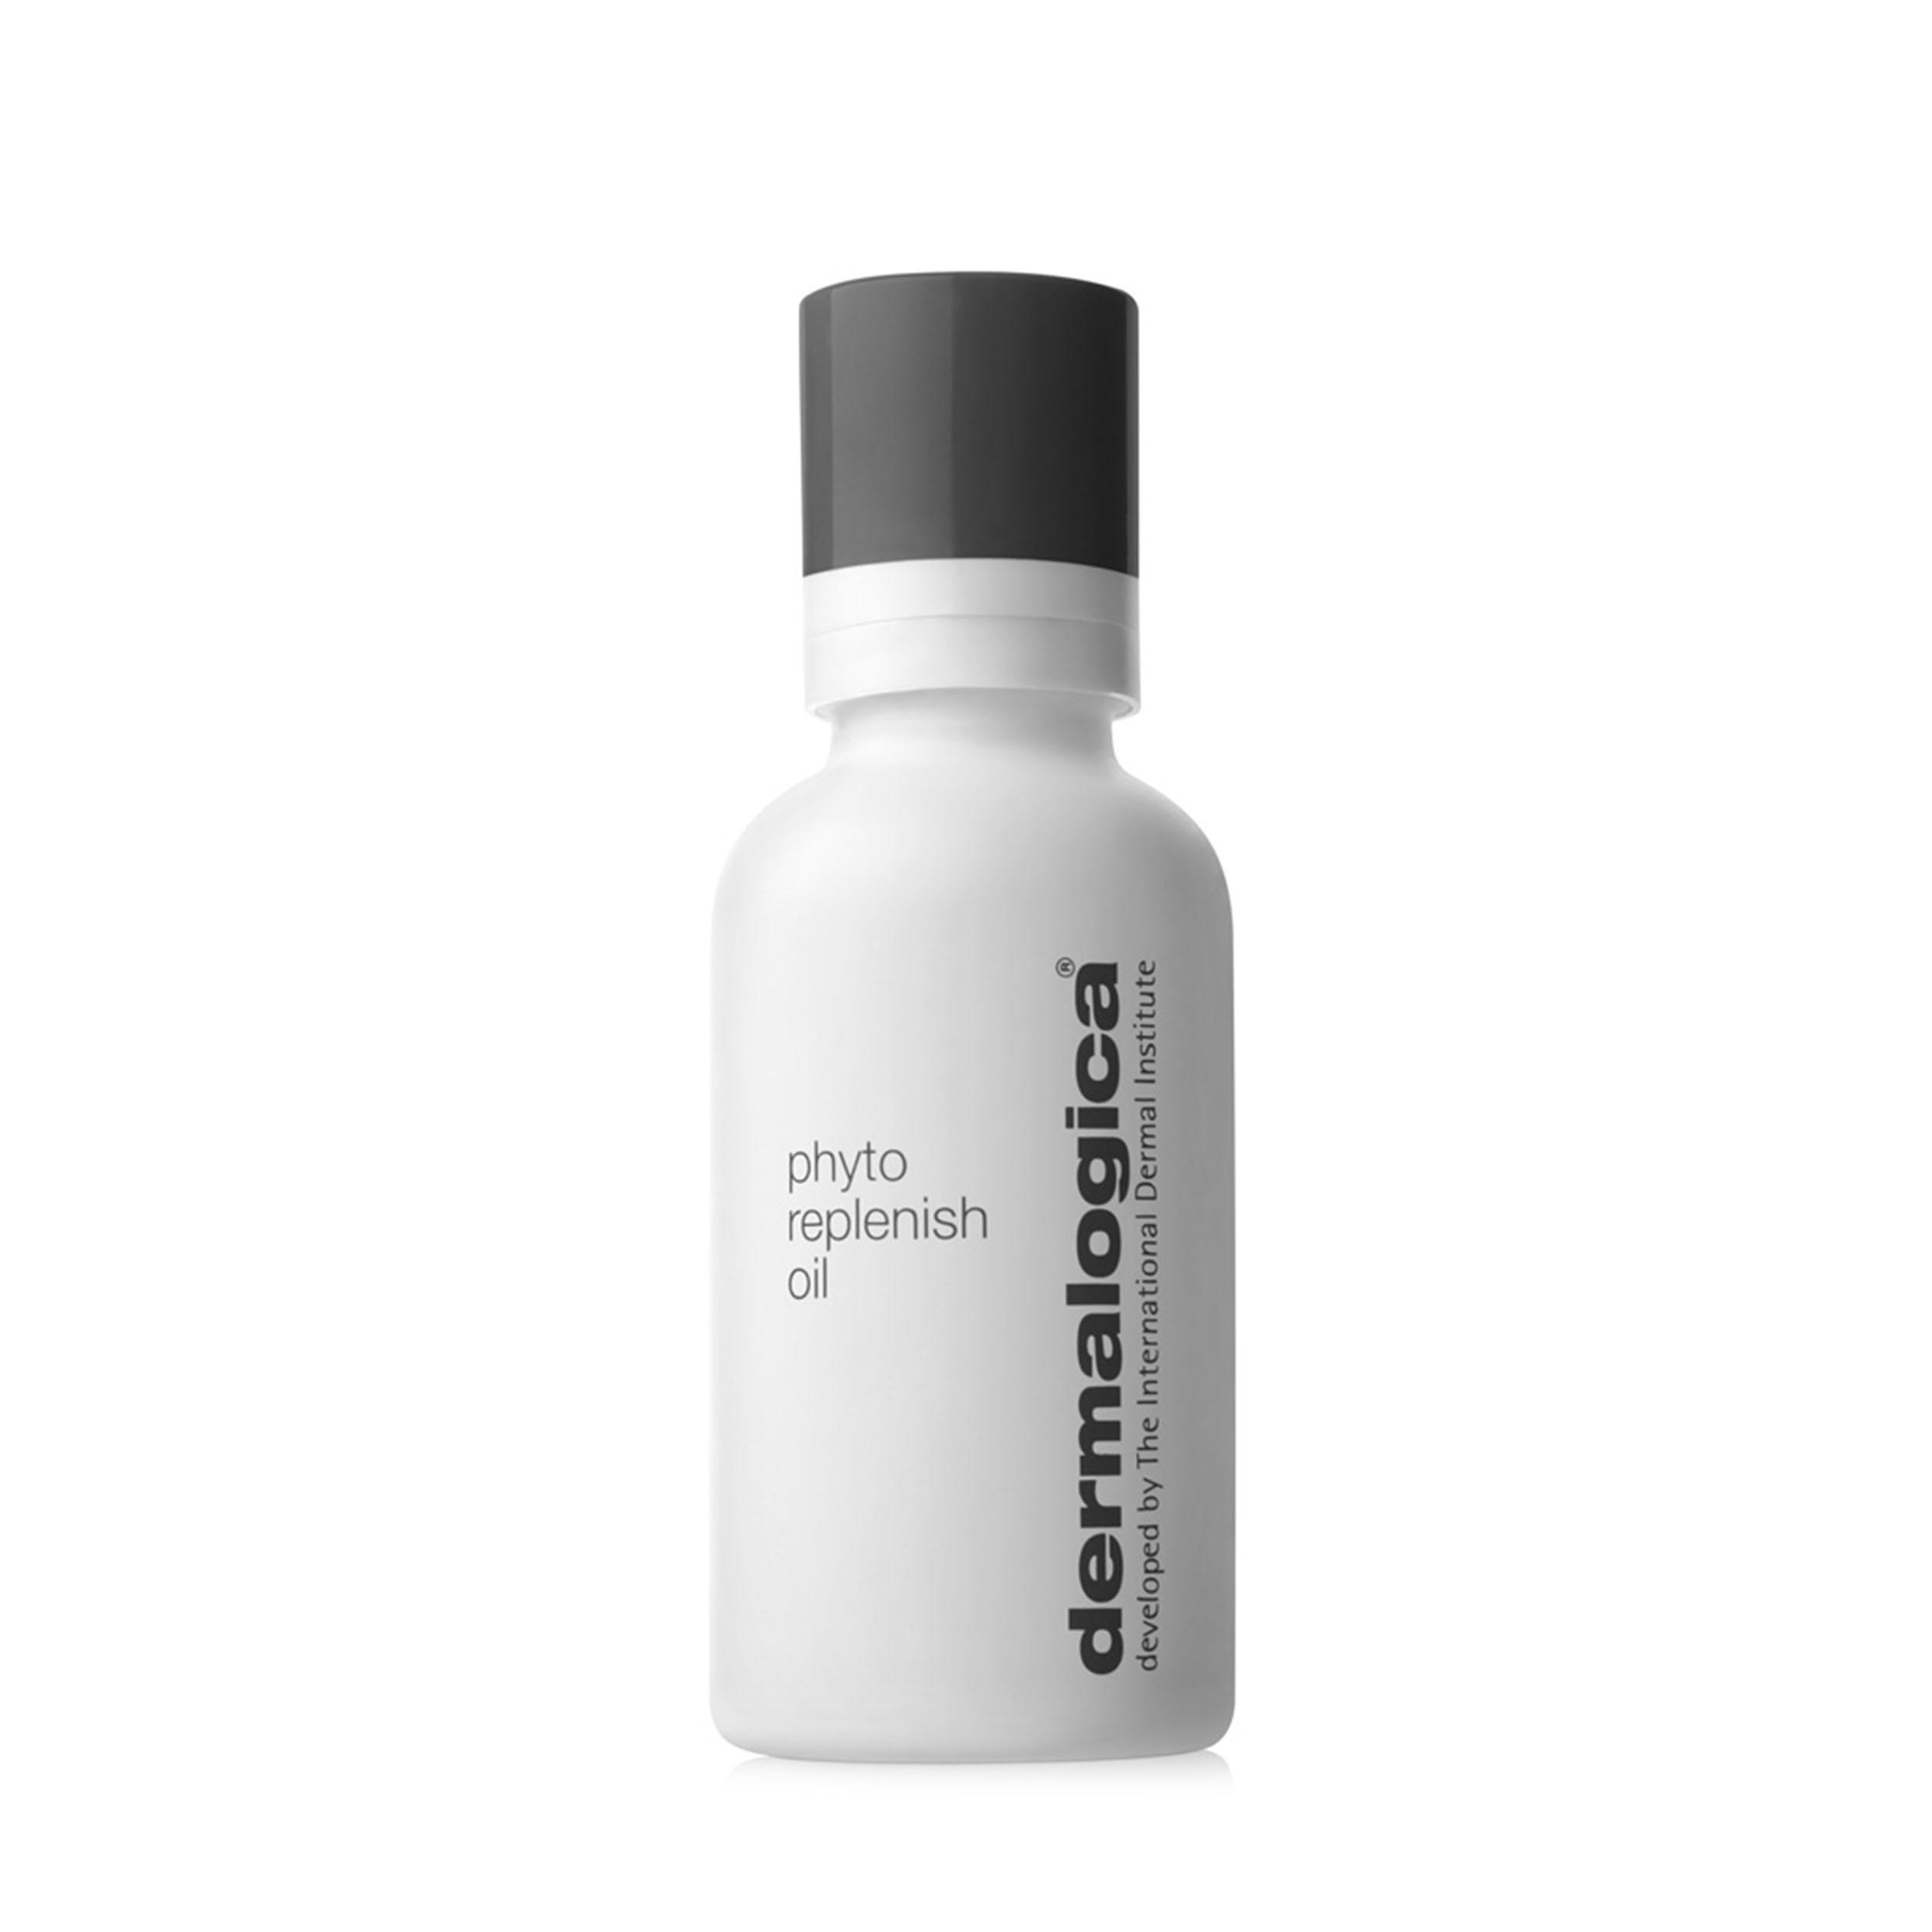 Dermalogica Фитовосстанавливающее масло для лица 30 мл фото